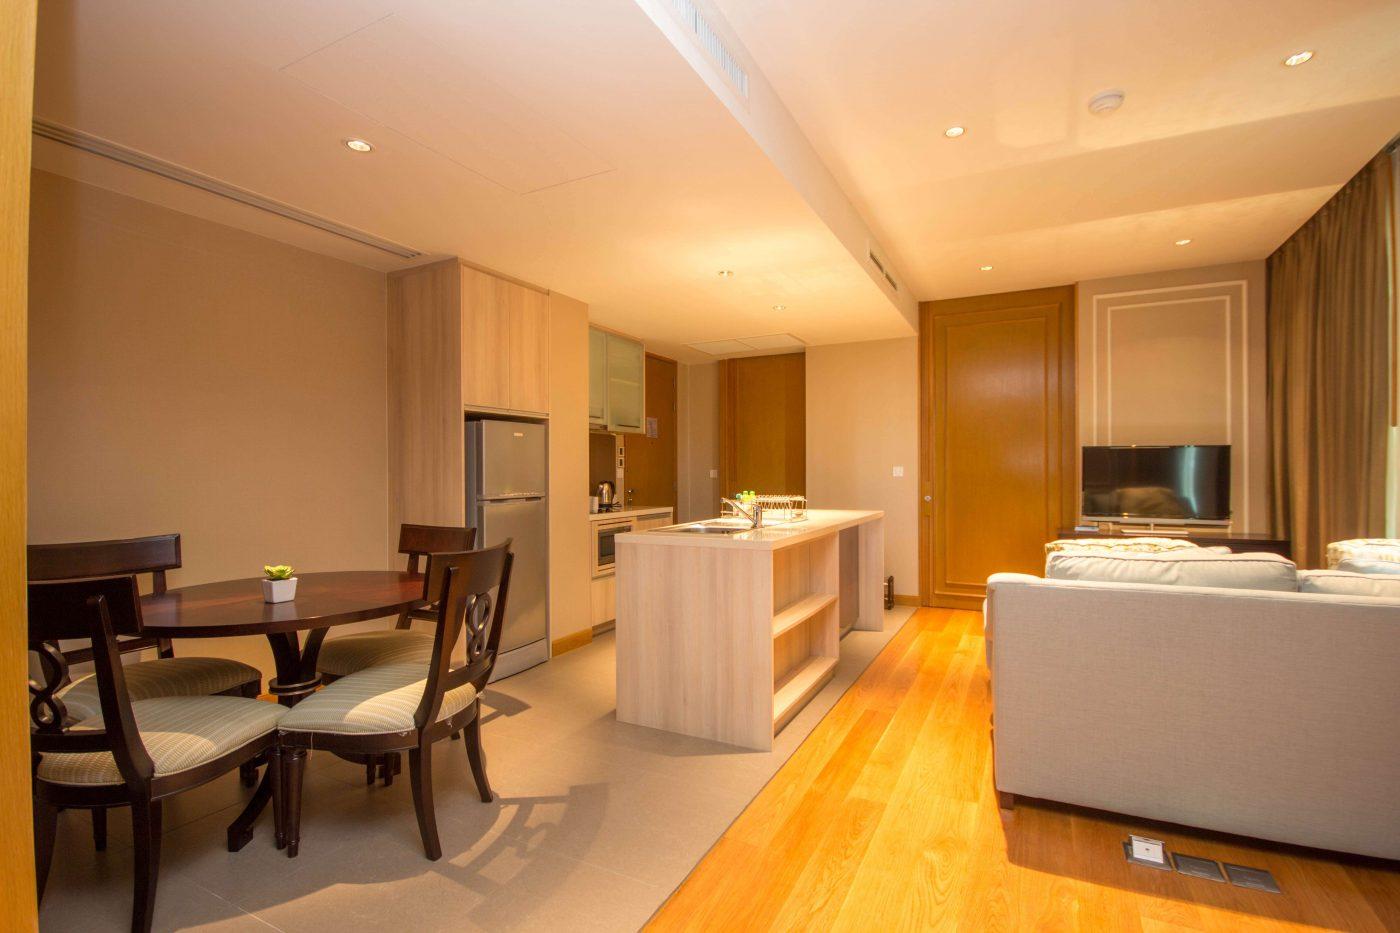 Condominium in the Heart  for Sale